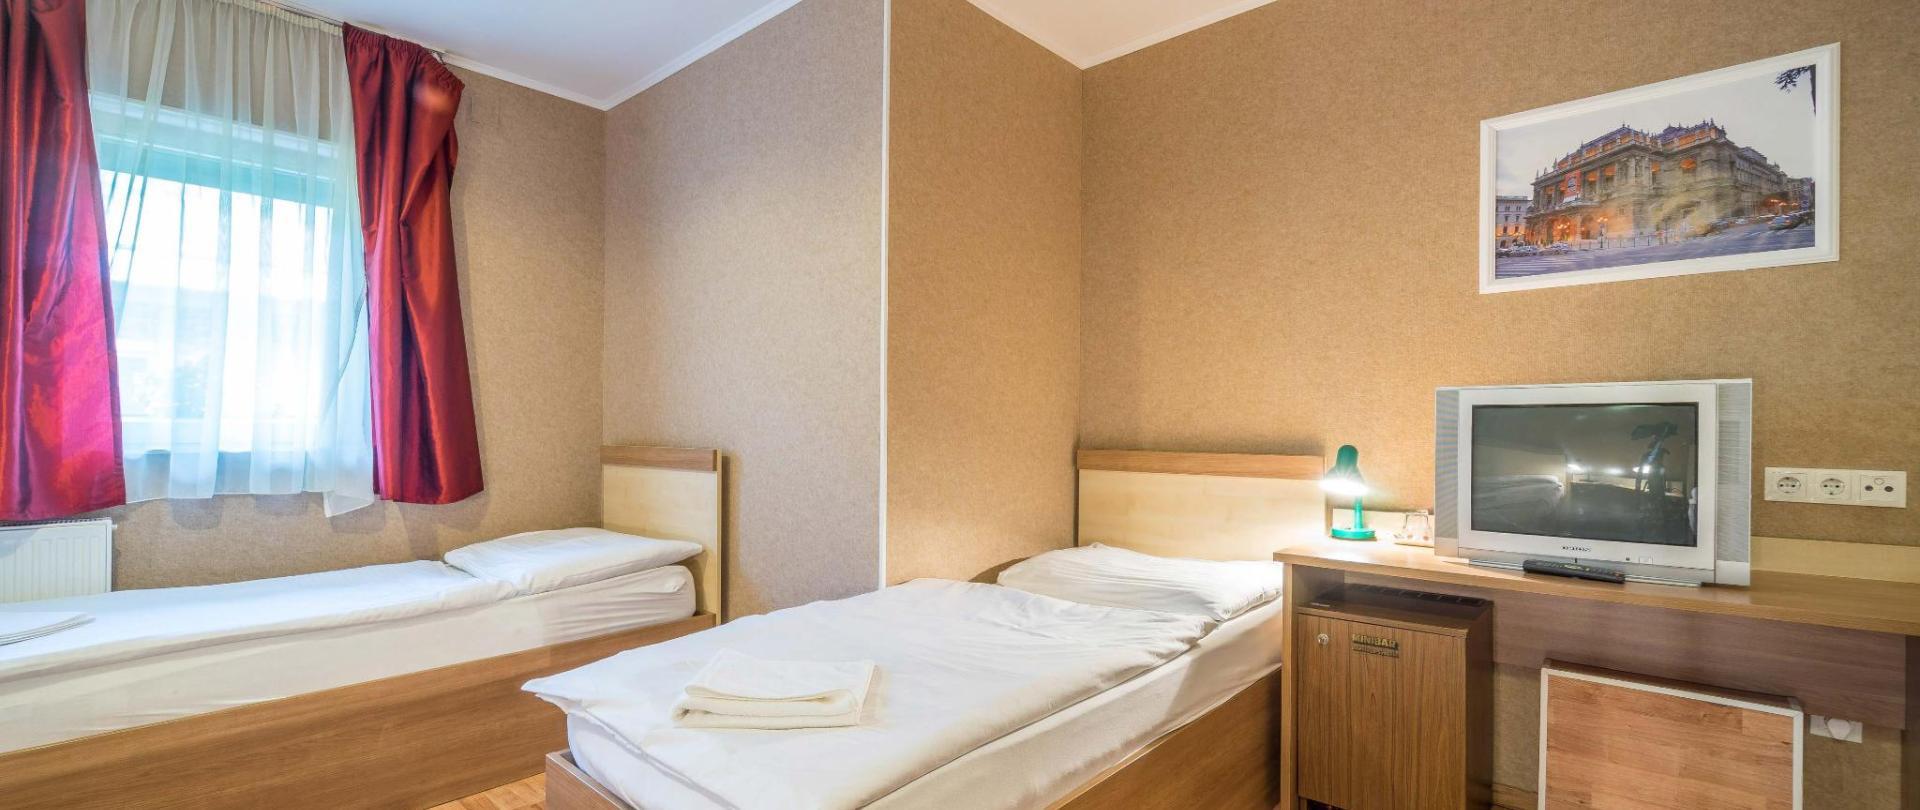 Silver_Hotel (29 of 49).jpg